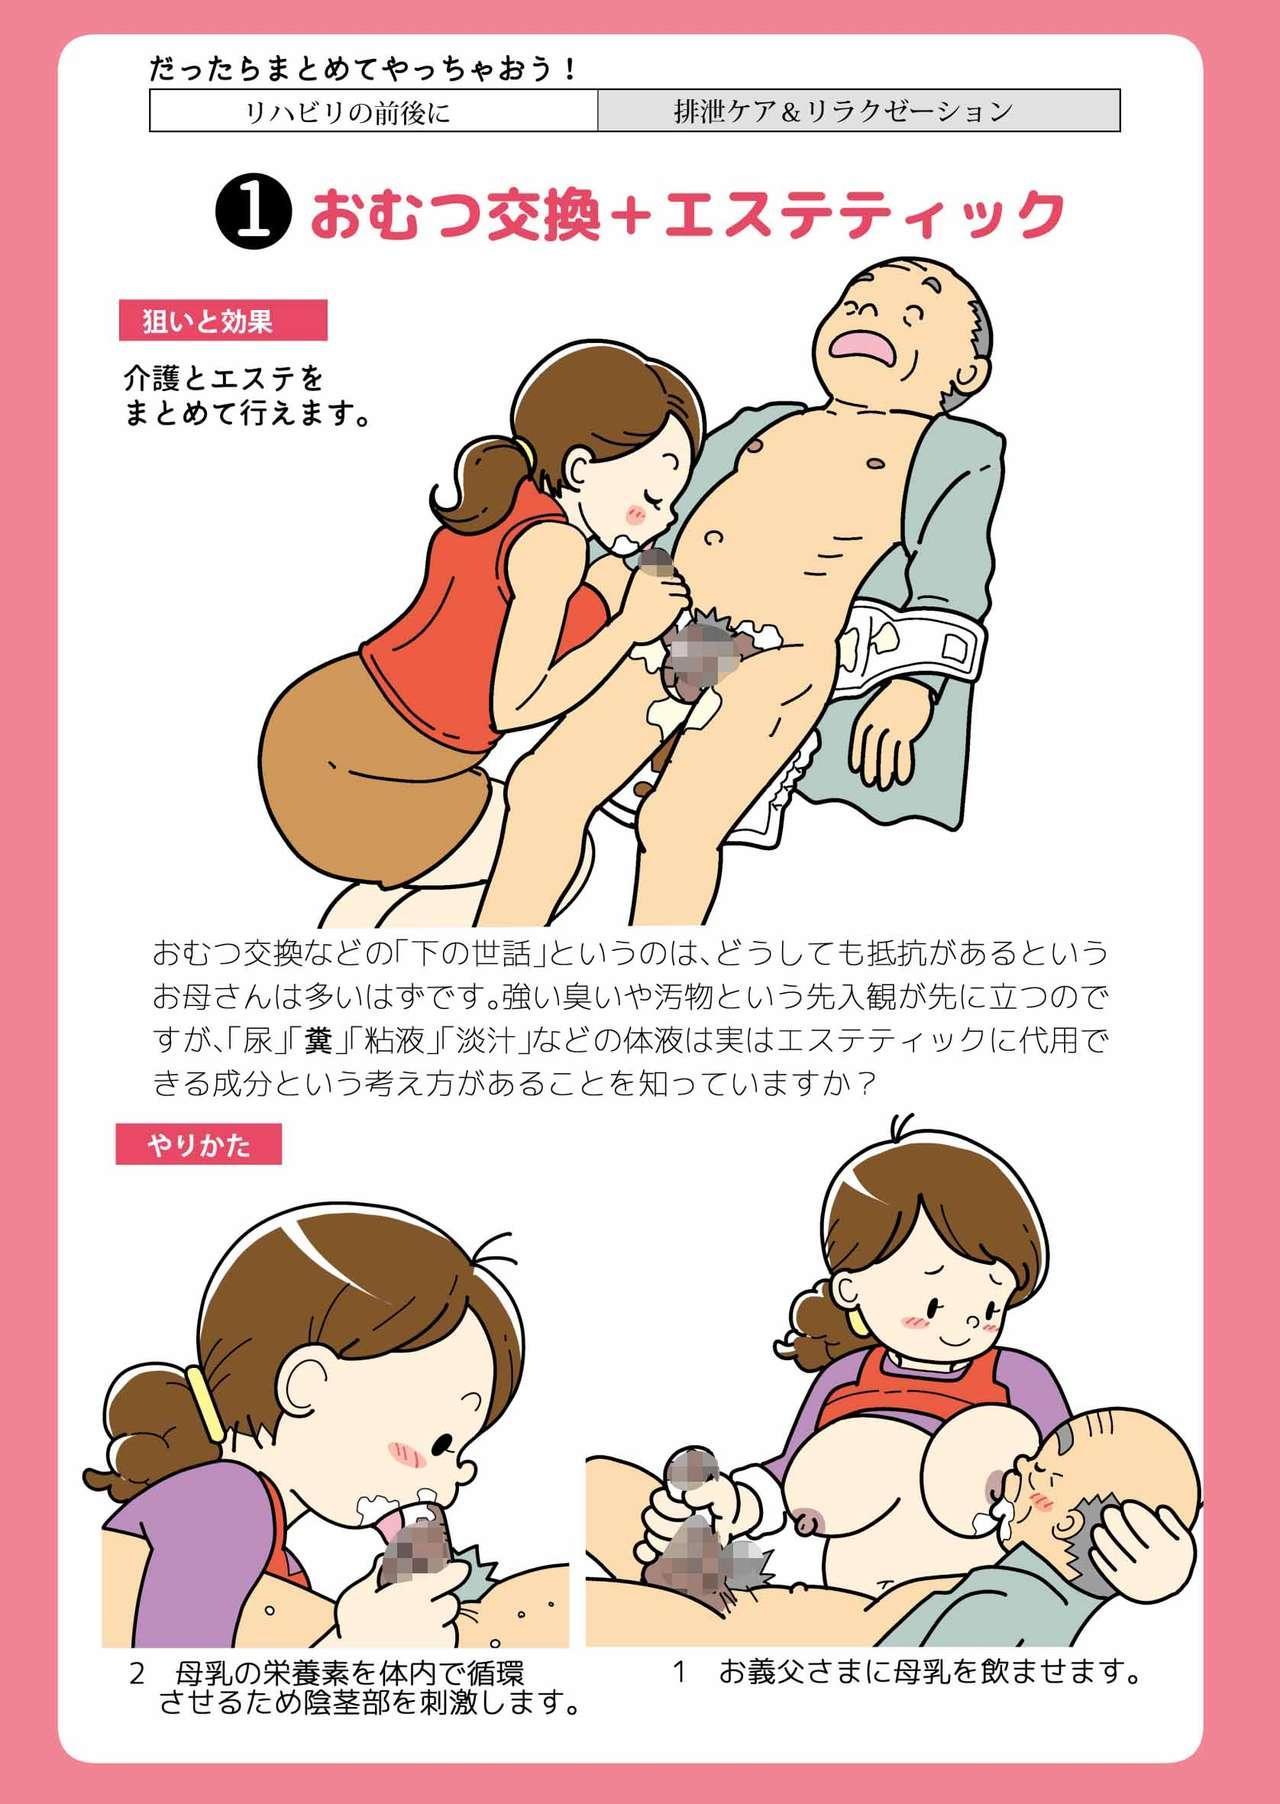 Isogasii Okaasan No Tamuno Sasa Rouzin Seikaigo | Guide for Elderly Sex Health Care to Busy Mom 35